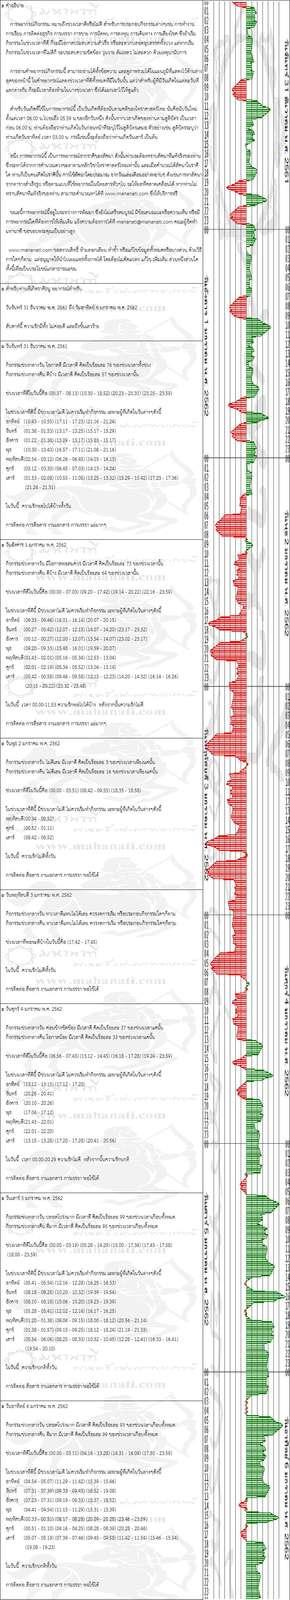 pkan2p5r618PdVxC5nB-o.jpg